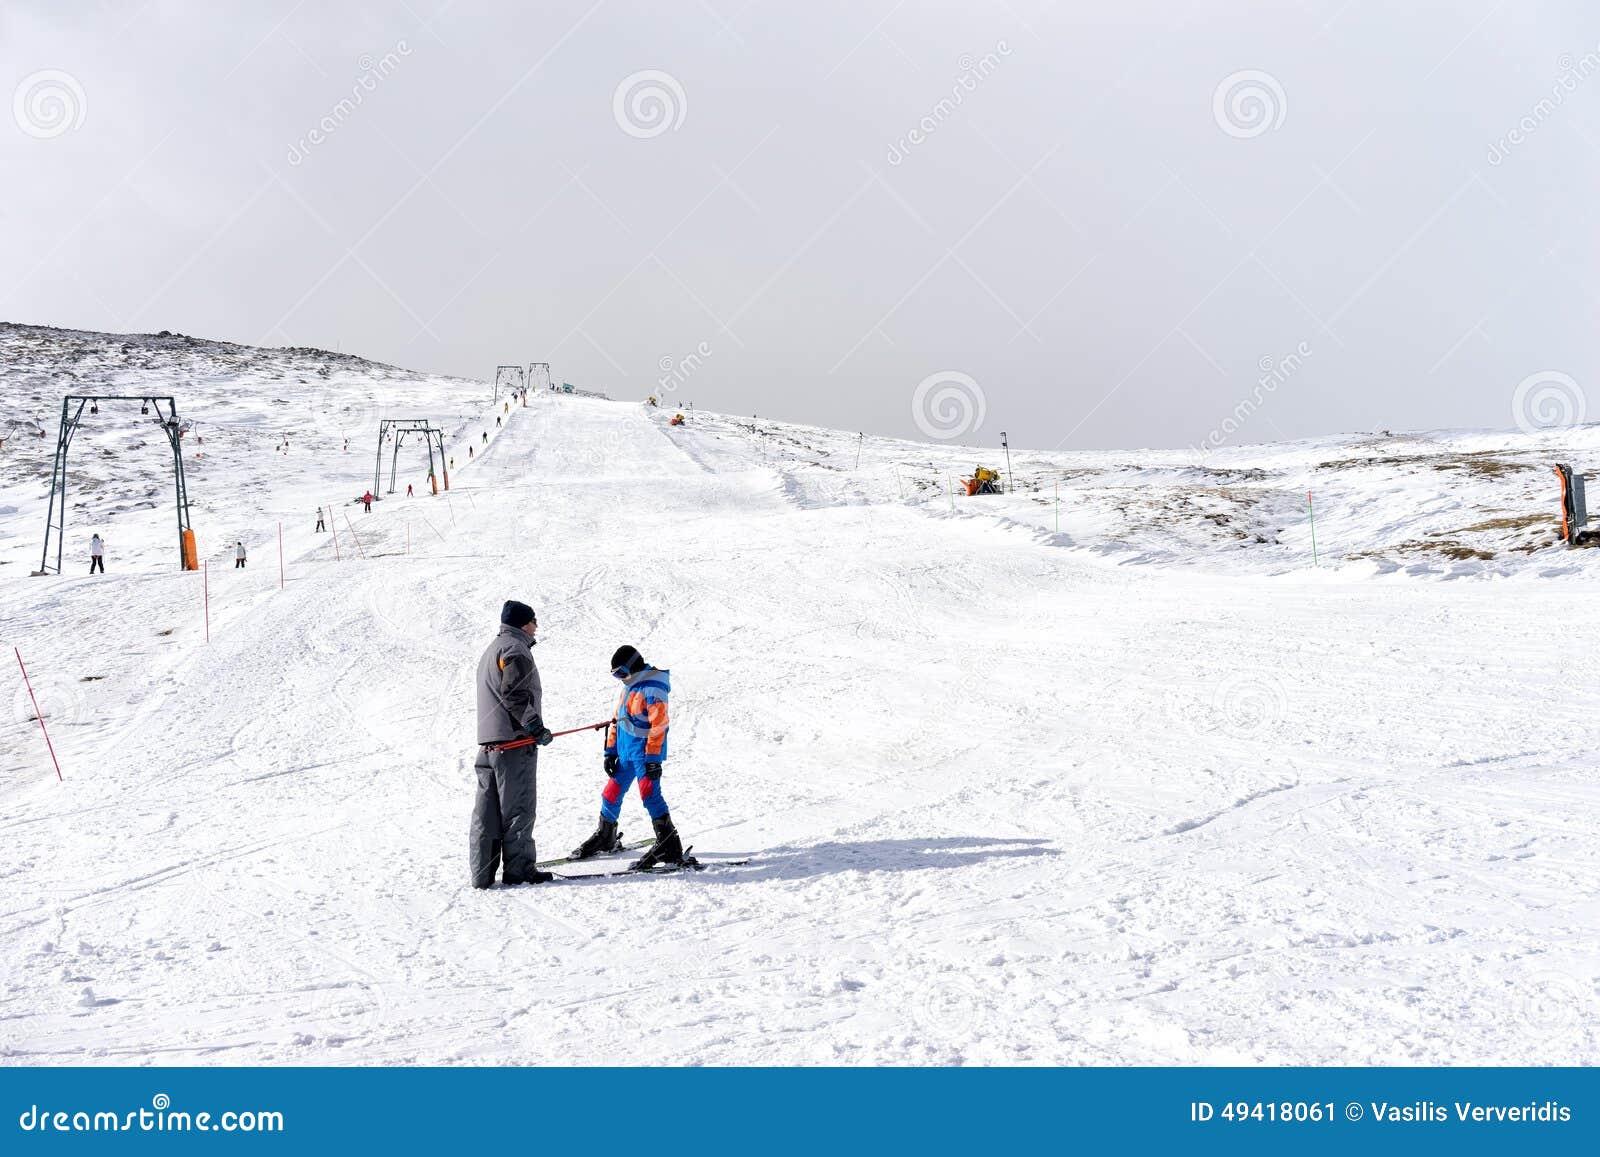 skiers enjoy the snow at kaimaktsalan ski center, in greece. rec